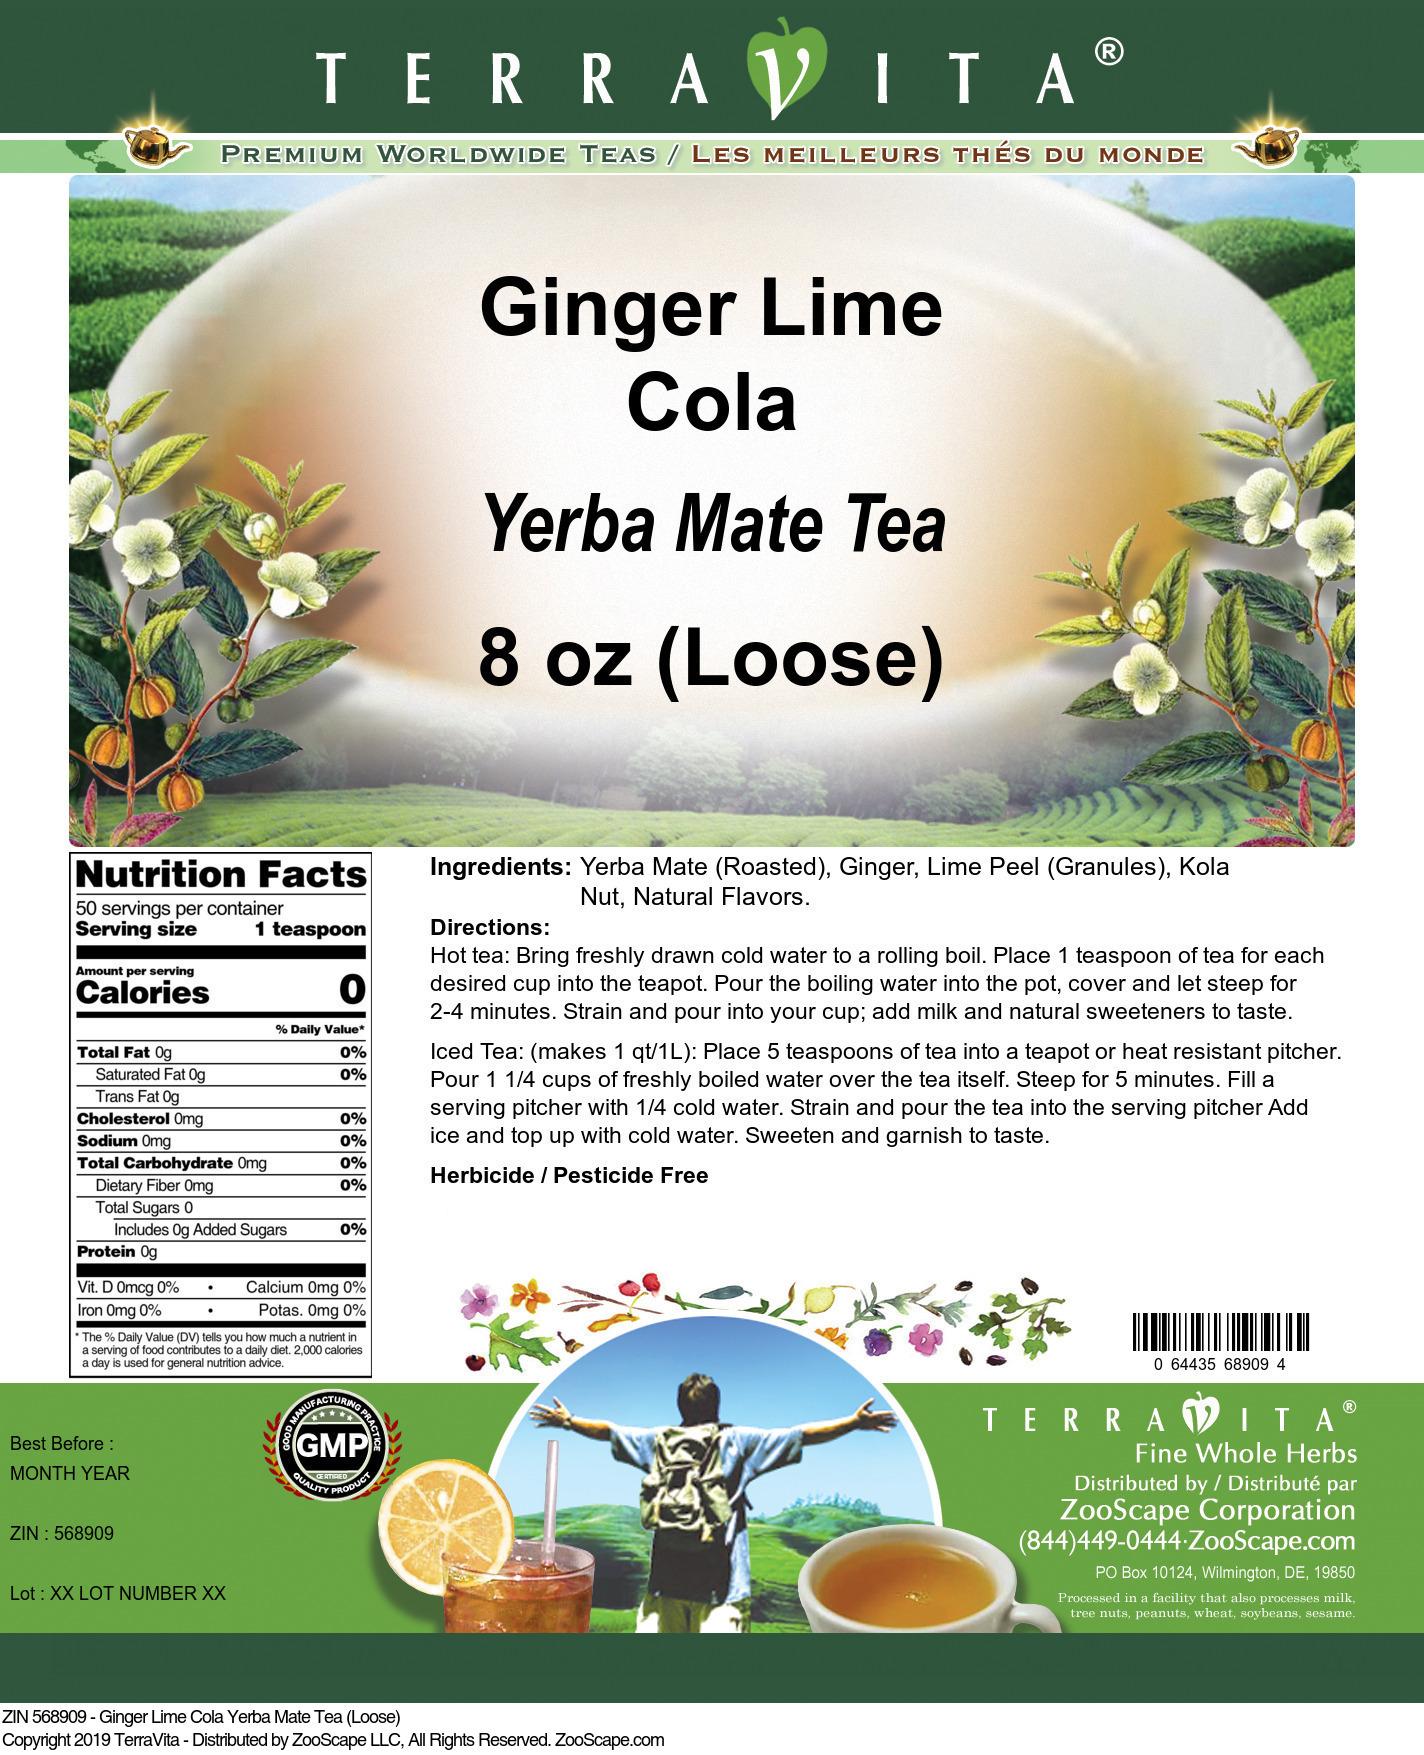 Ginger Lime Cola Yerba Mate